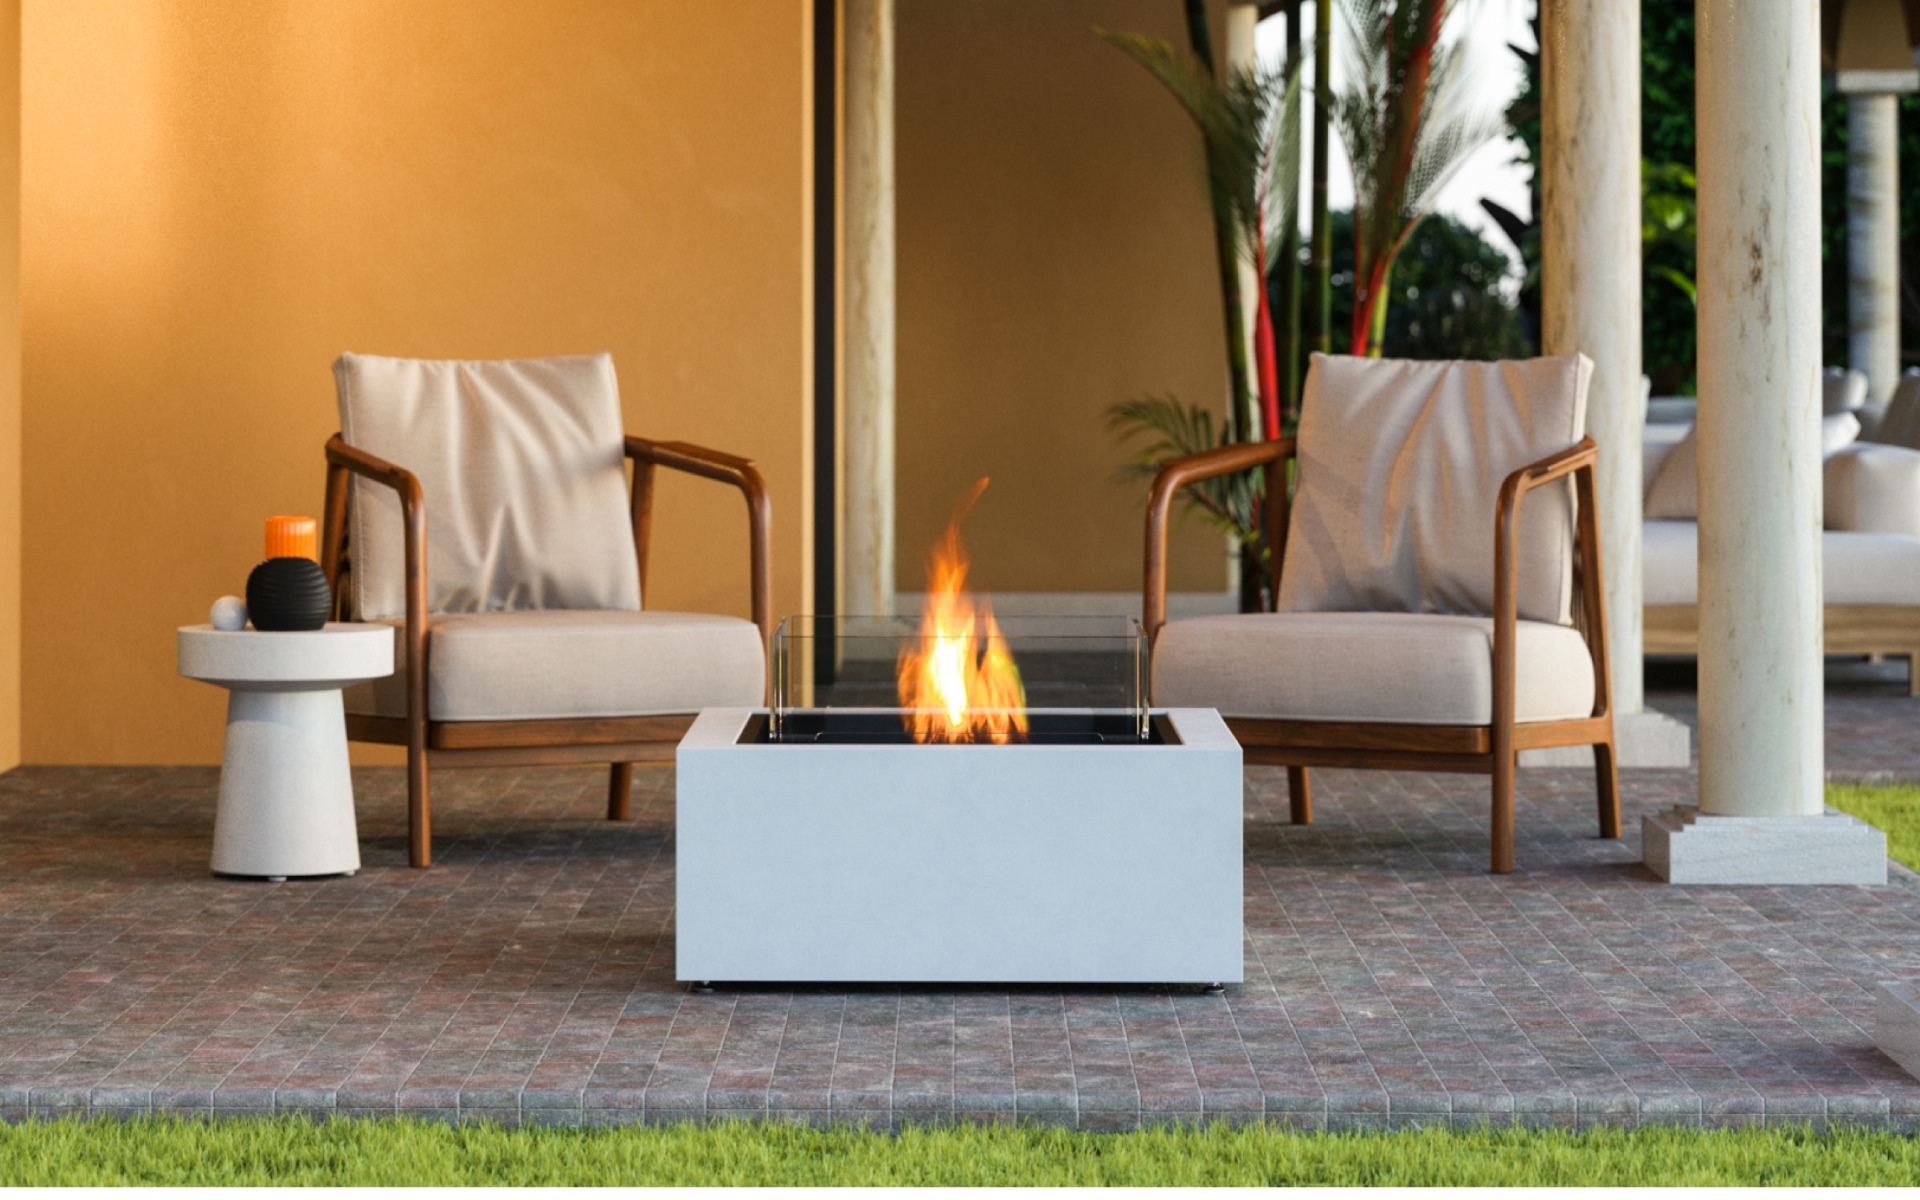 EcoSmart Fire Base 30 Fire Table outdoor lounge